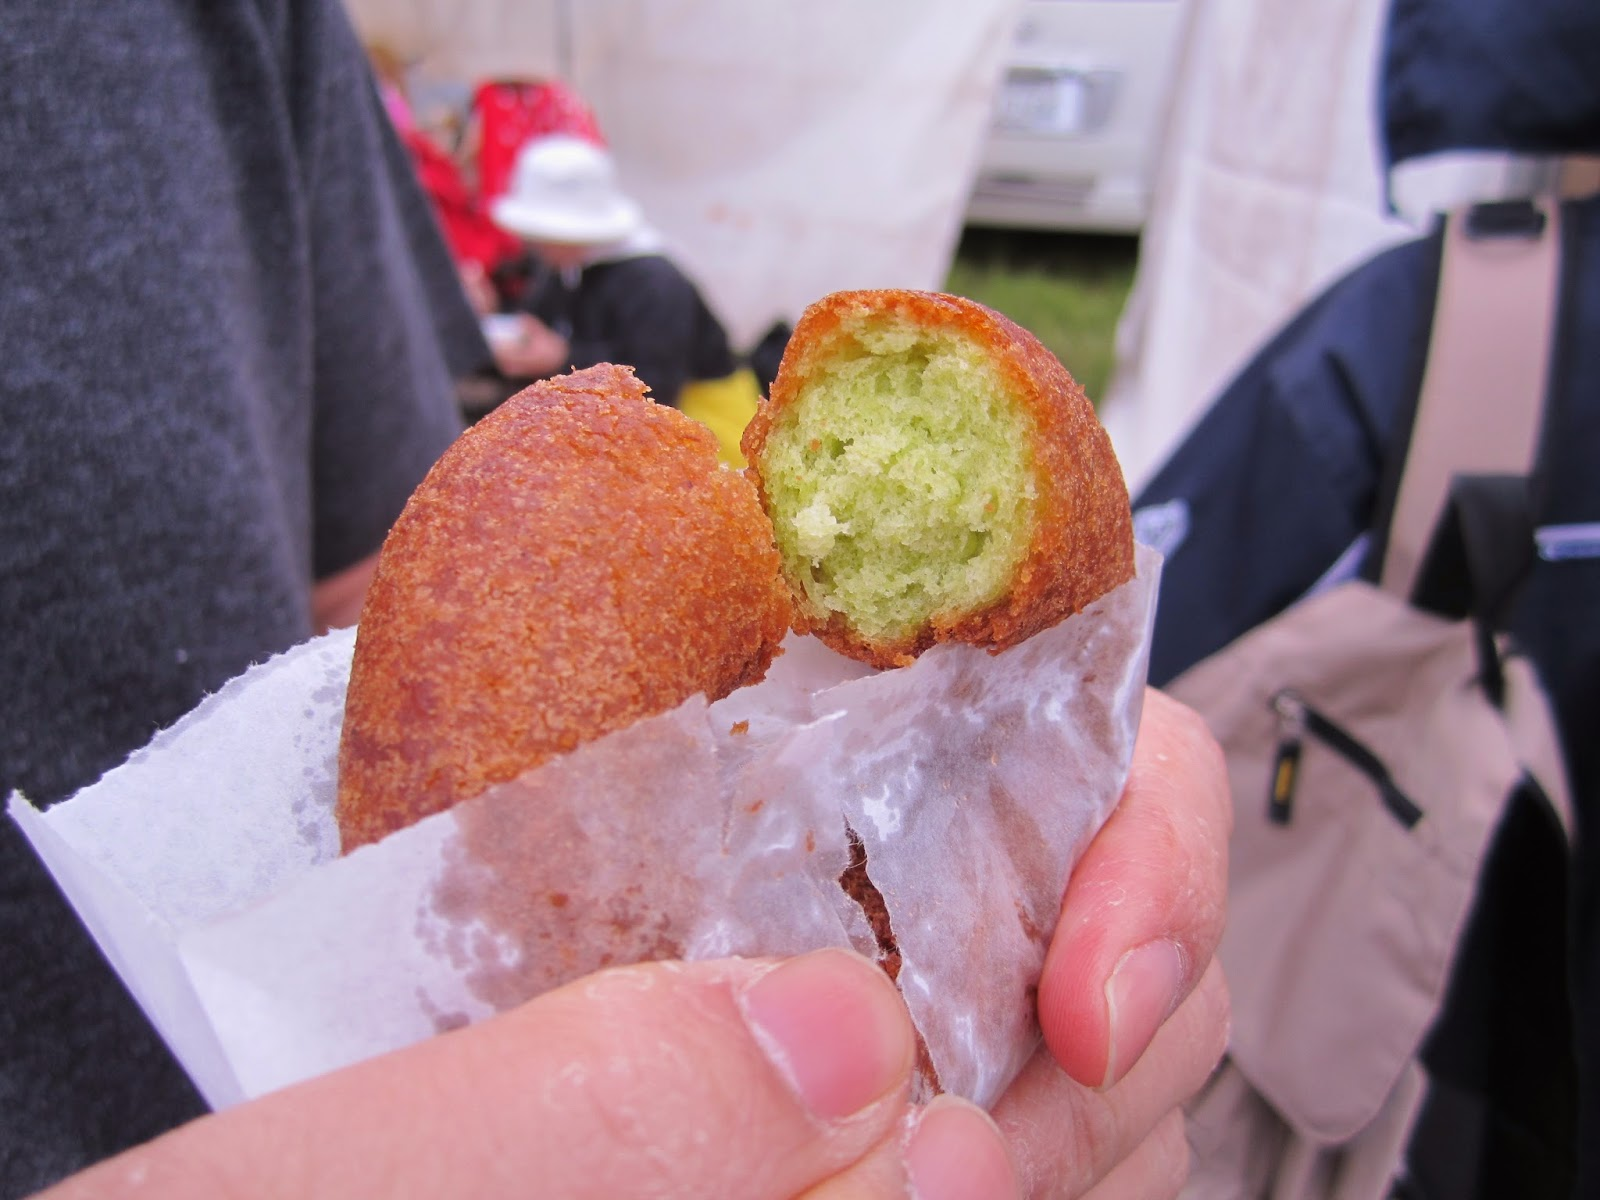 Canola Doughnut (2013 Canola Festival in Yokohama) 菜の花ドーナツ 2014菜の花フェスティバルinよこはま